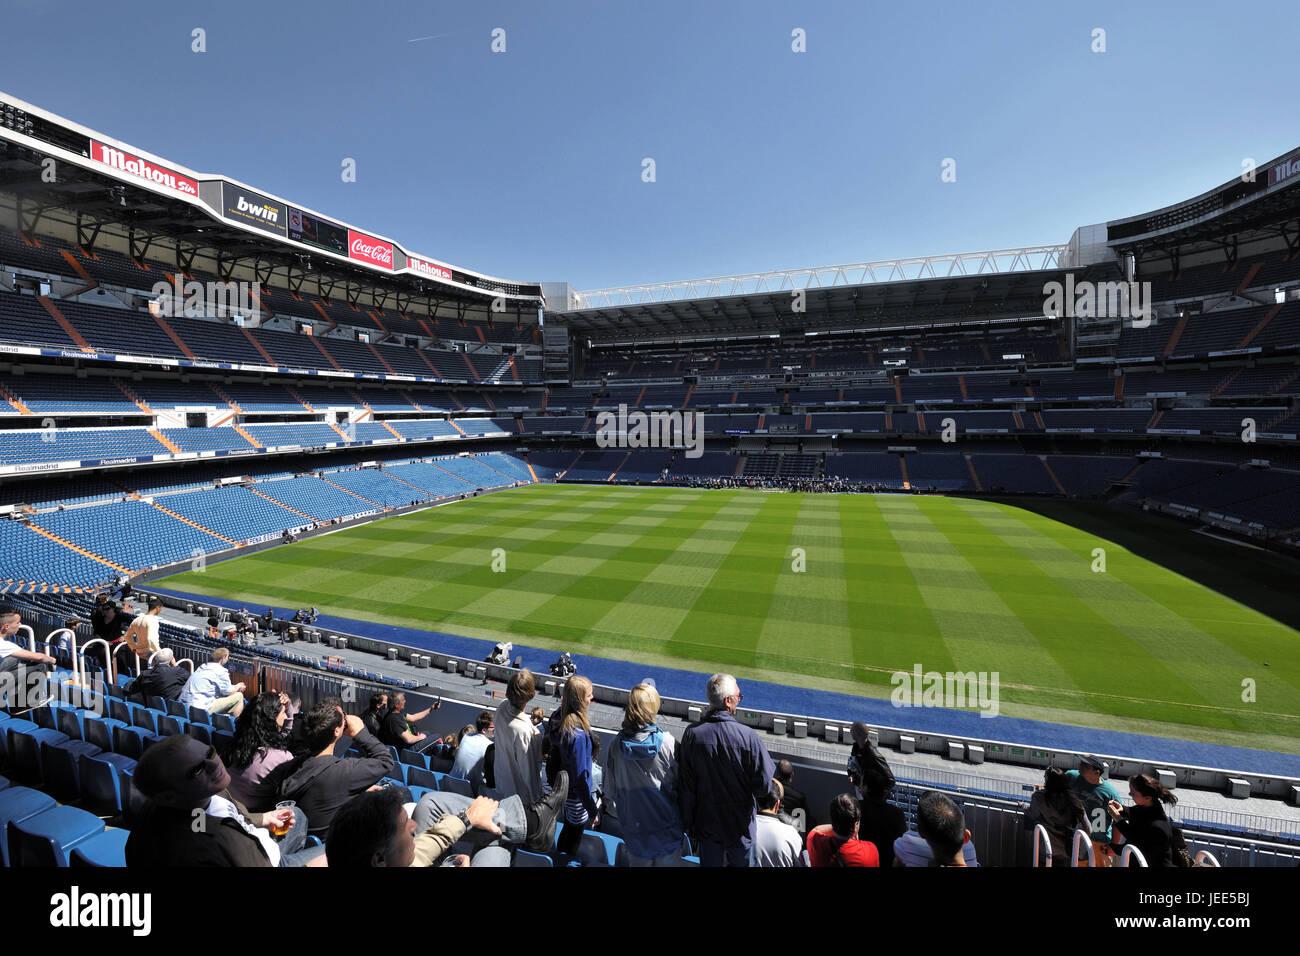 Spain, Madrid, Santiago Bernabeu stadium, stand, spectator, - Stock Image